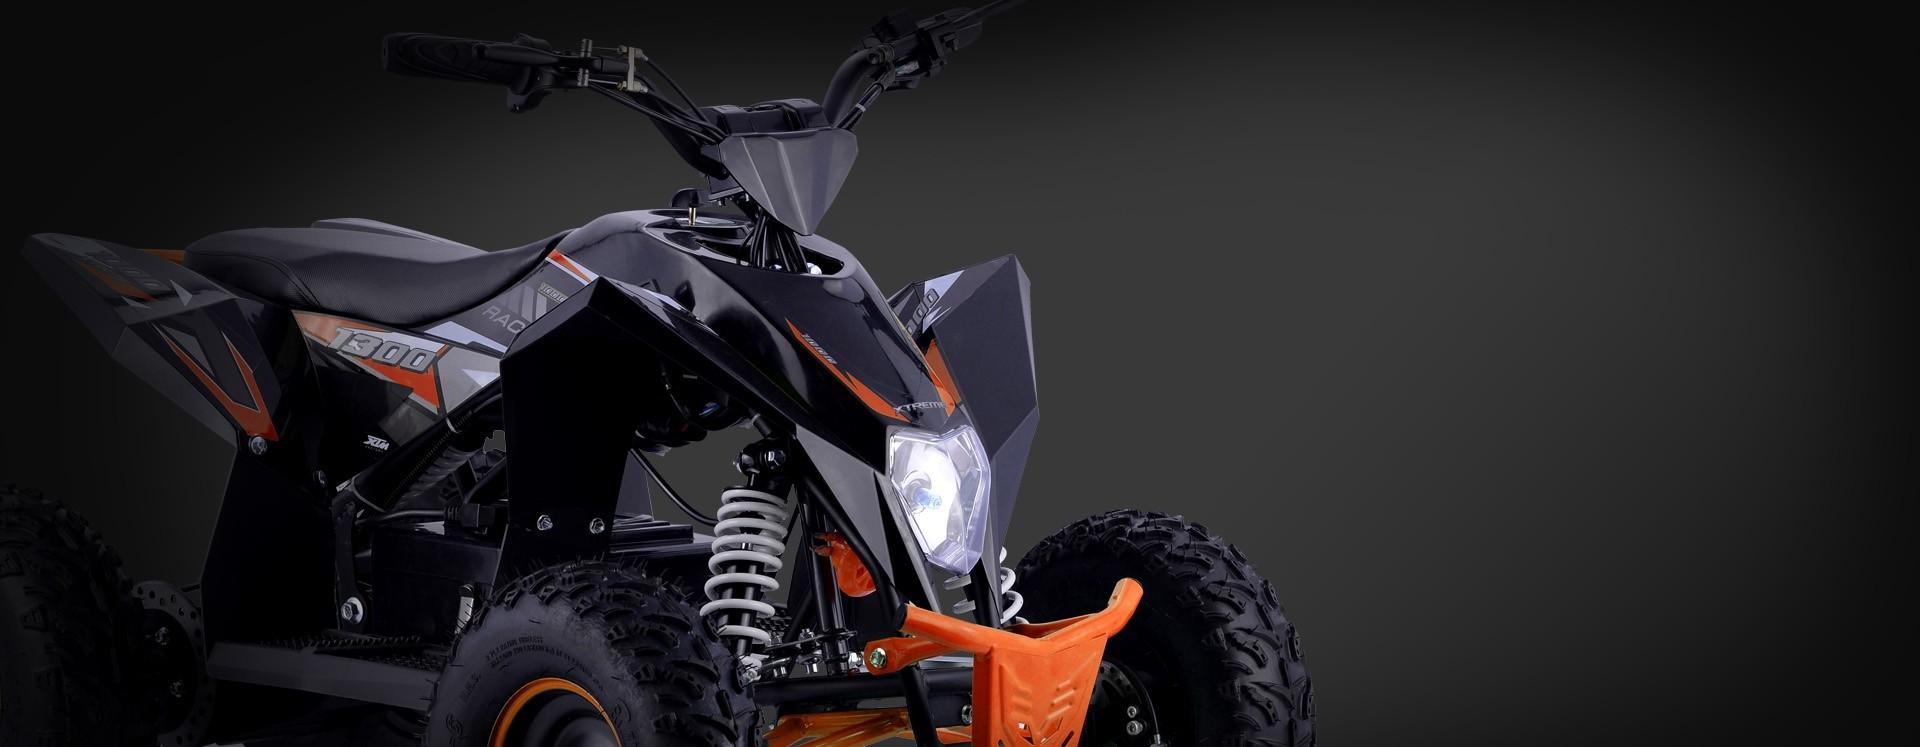 XTM RACING 48v 1300w LITHIUM QUAD BIKE BLACK ORANGE